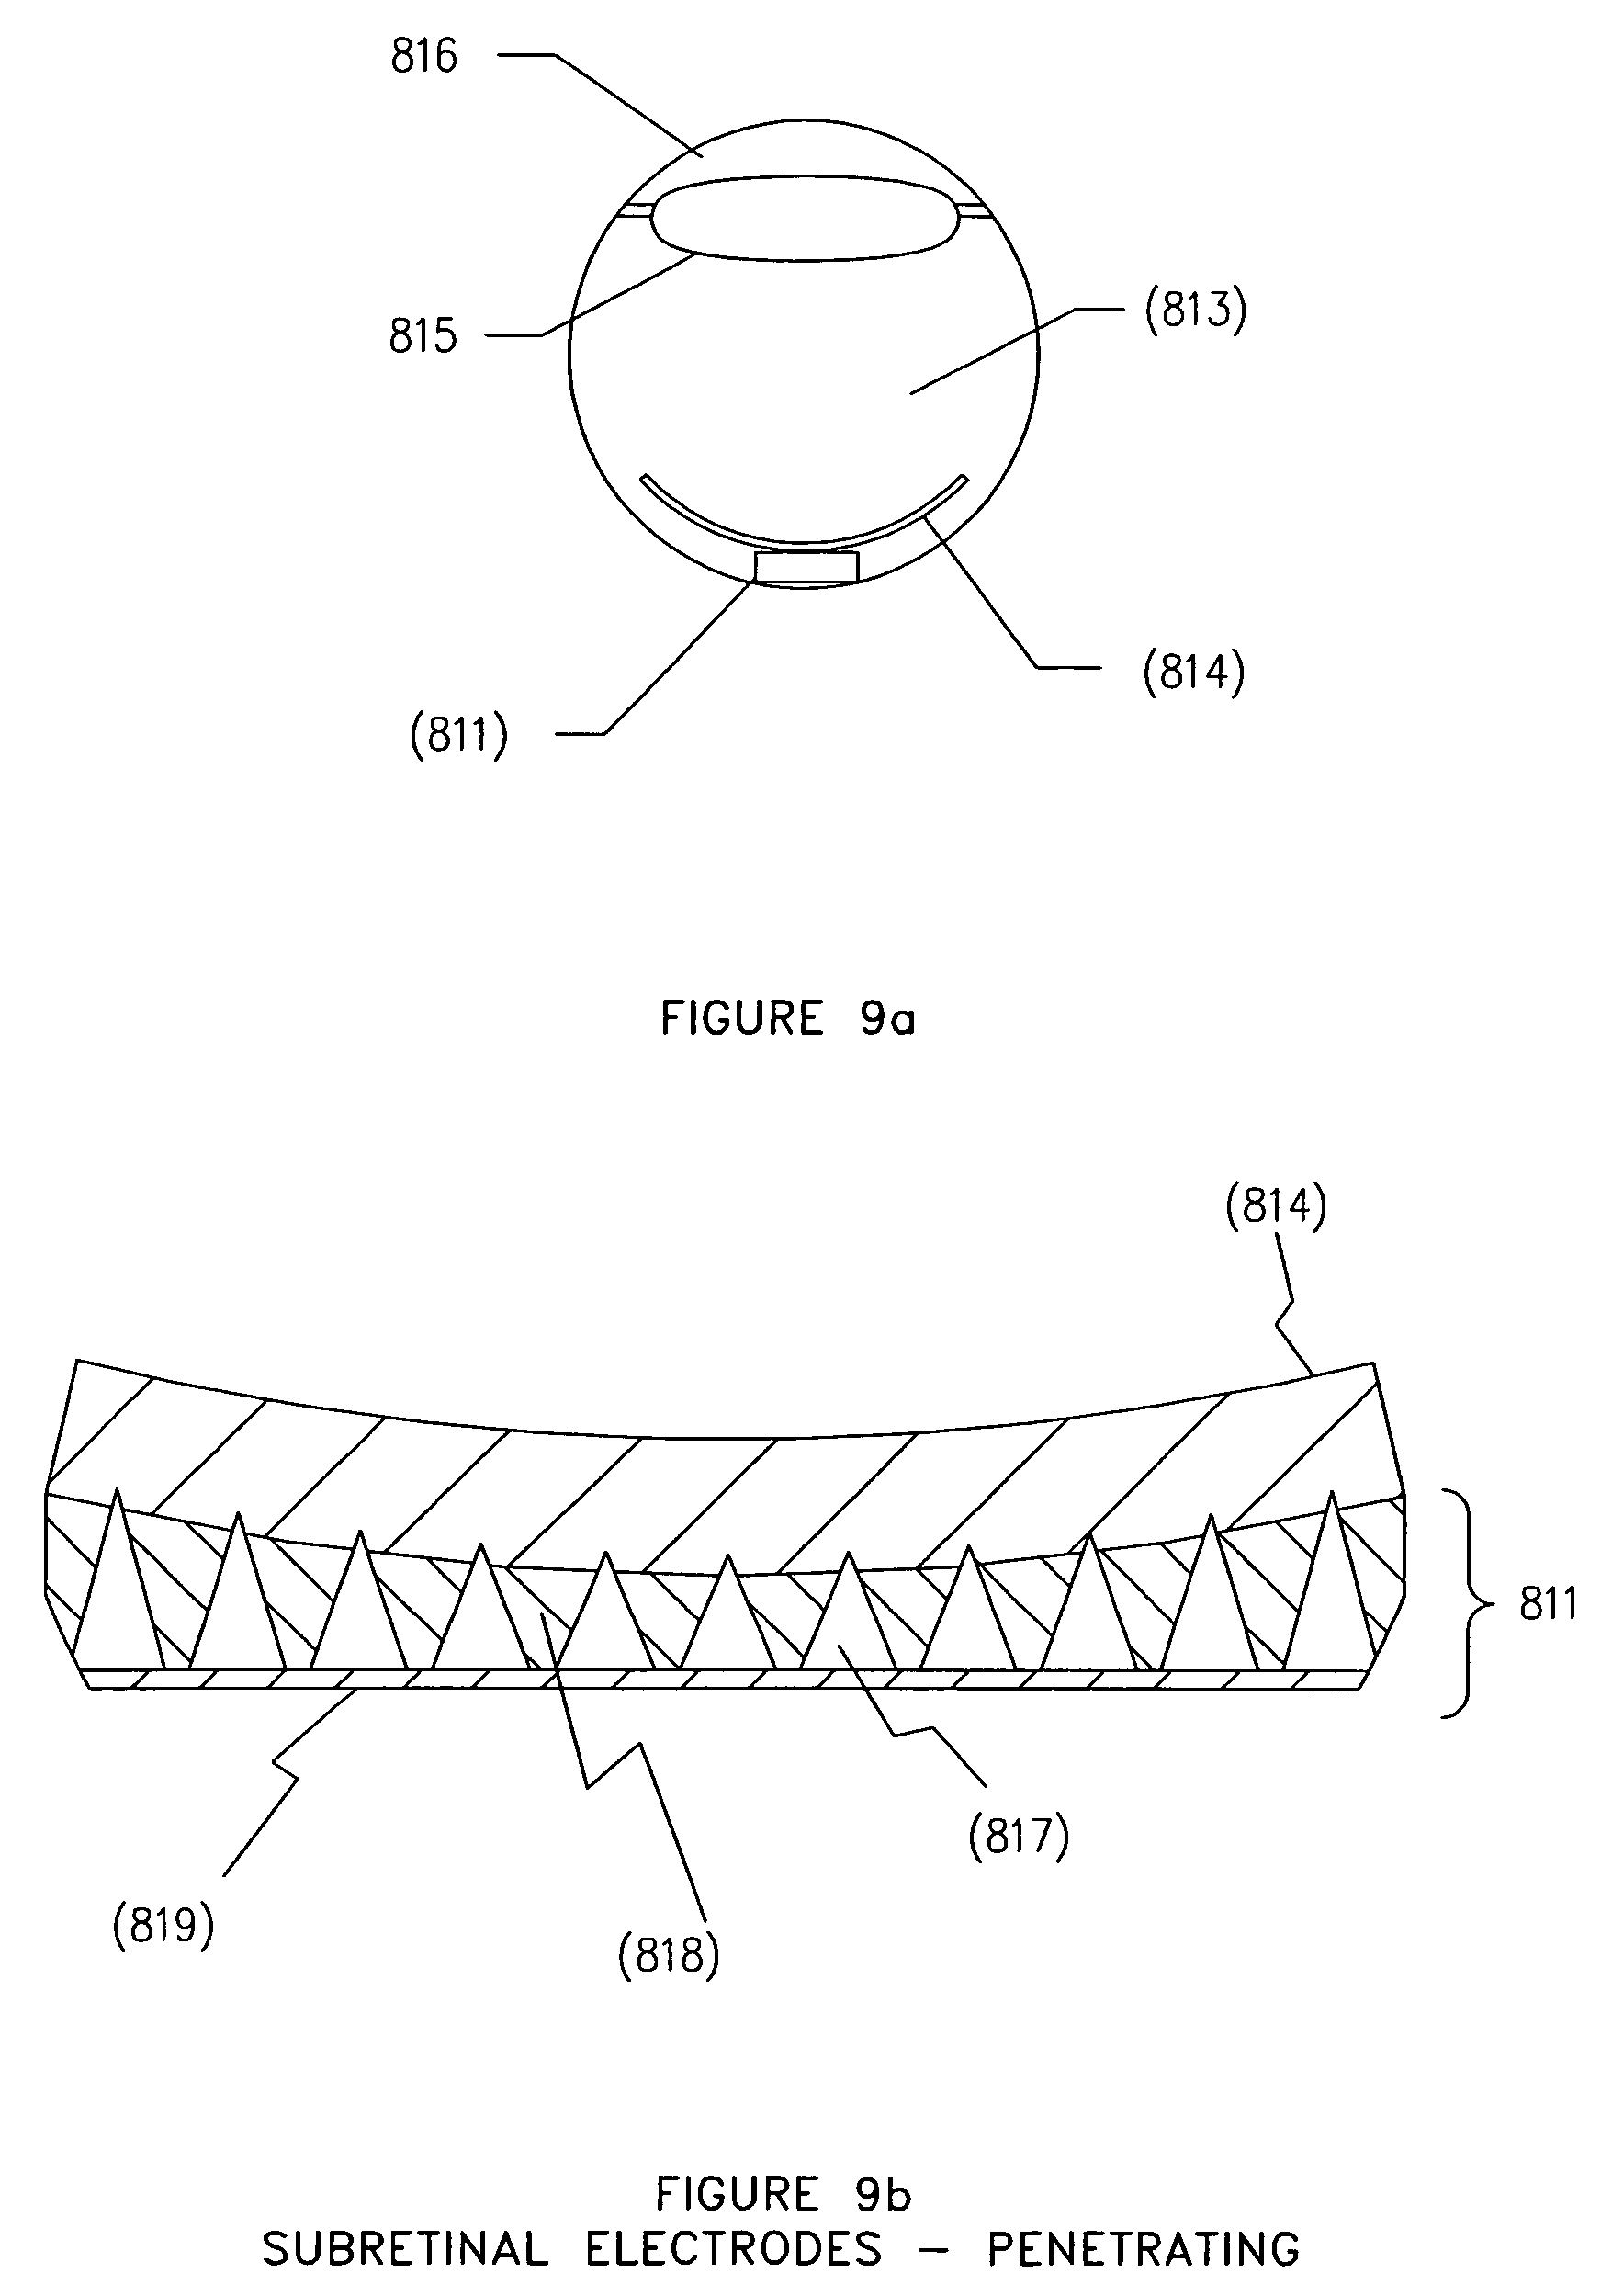 visual prothesis Fig 1: electric stimulation to the optic nerve (veraart, c, et al pattern recognition with the optic nerve visual prosthesis artificial organs 2711.